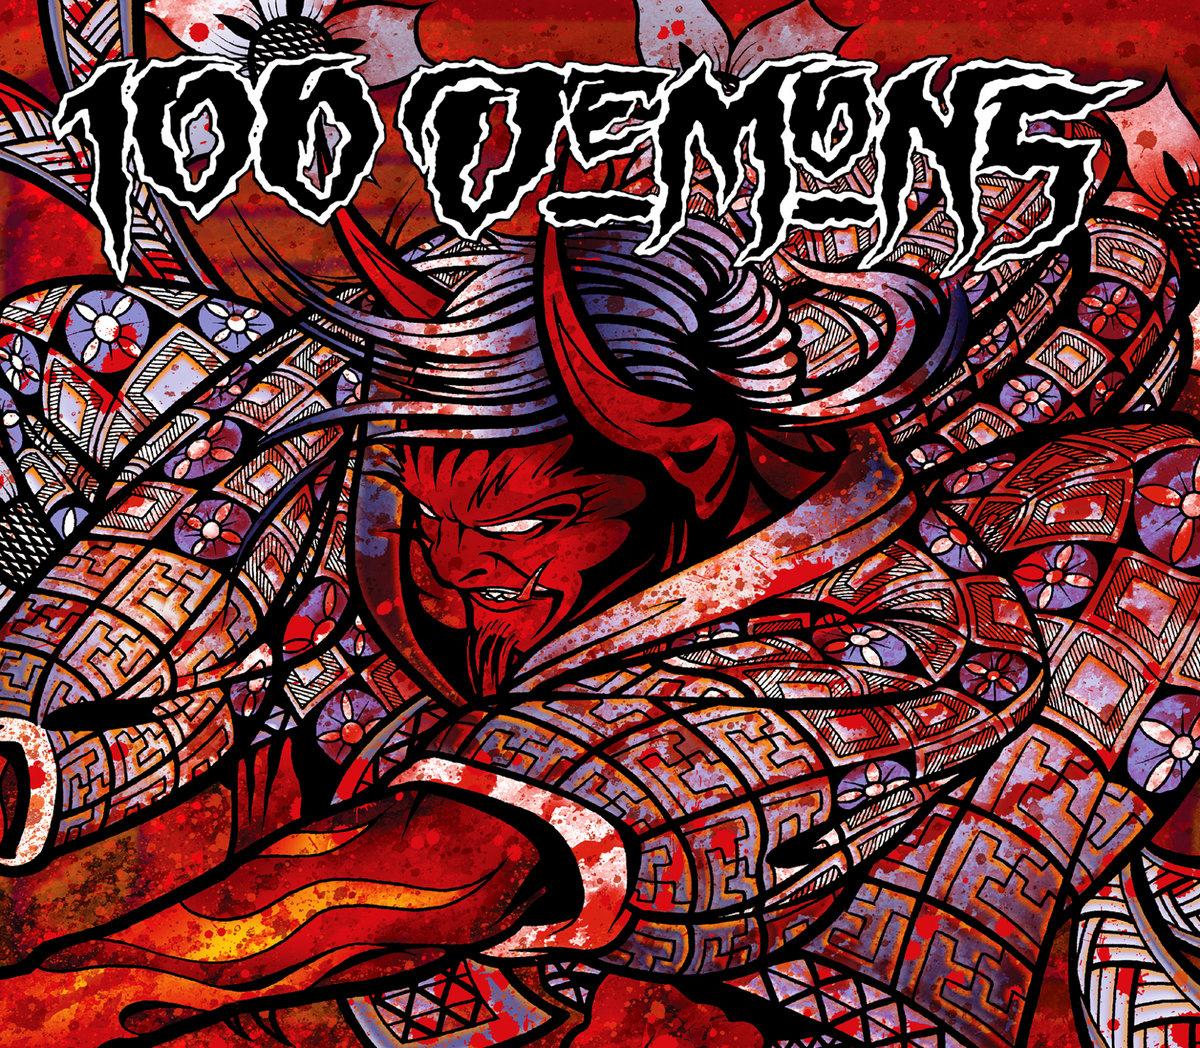 100 Demons | Deathwish